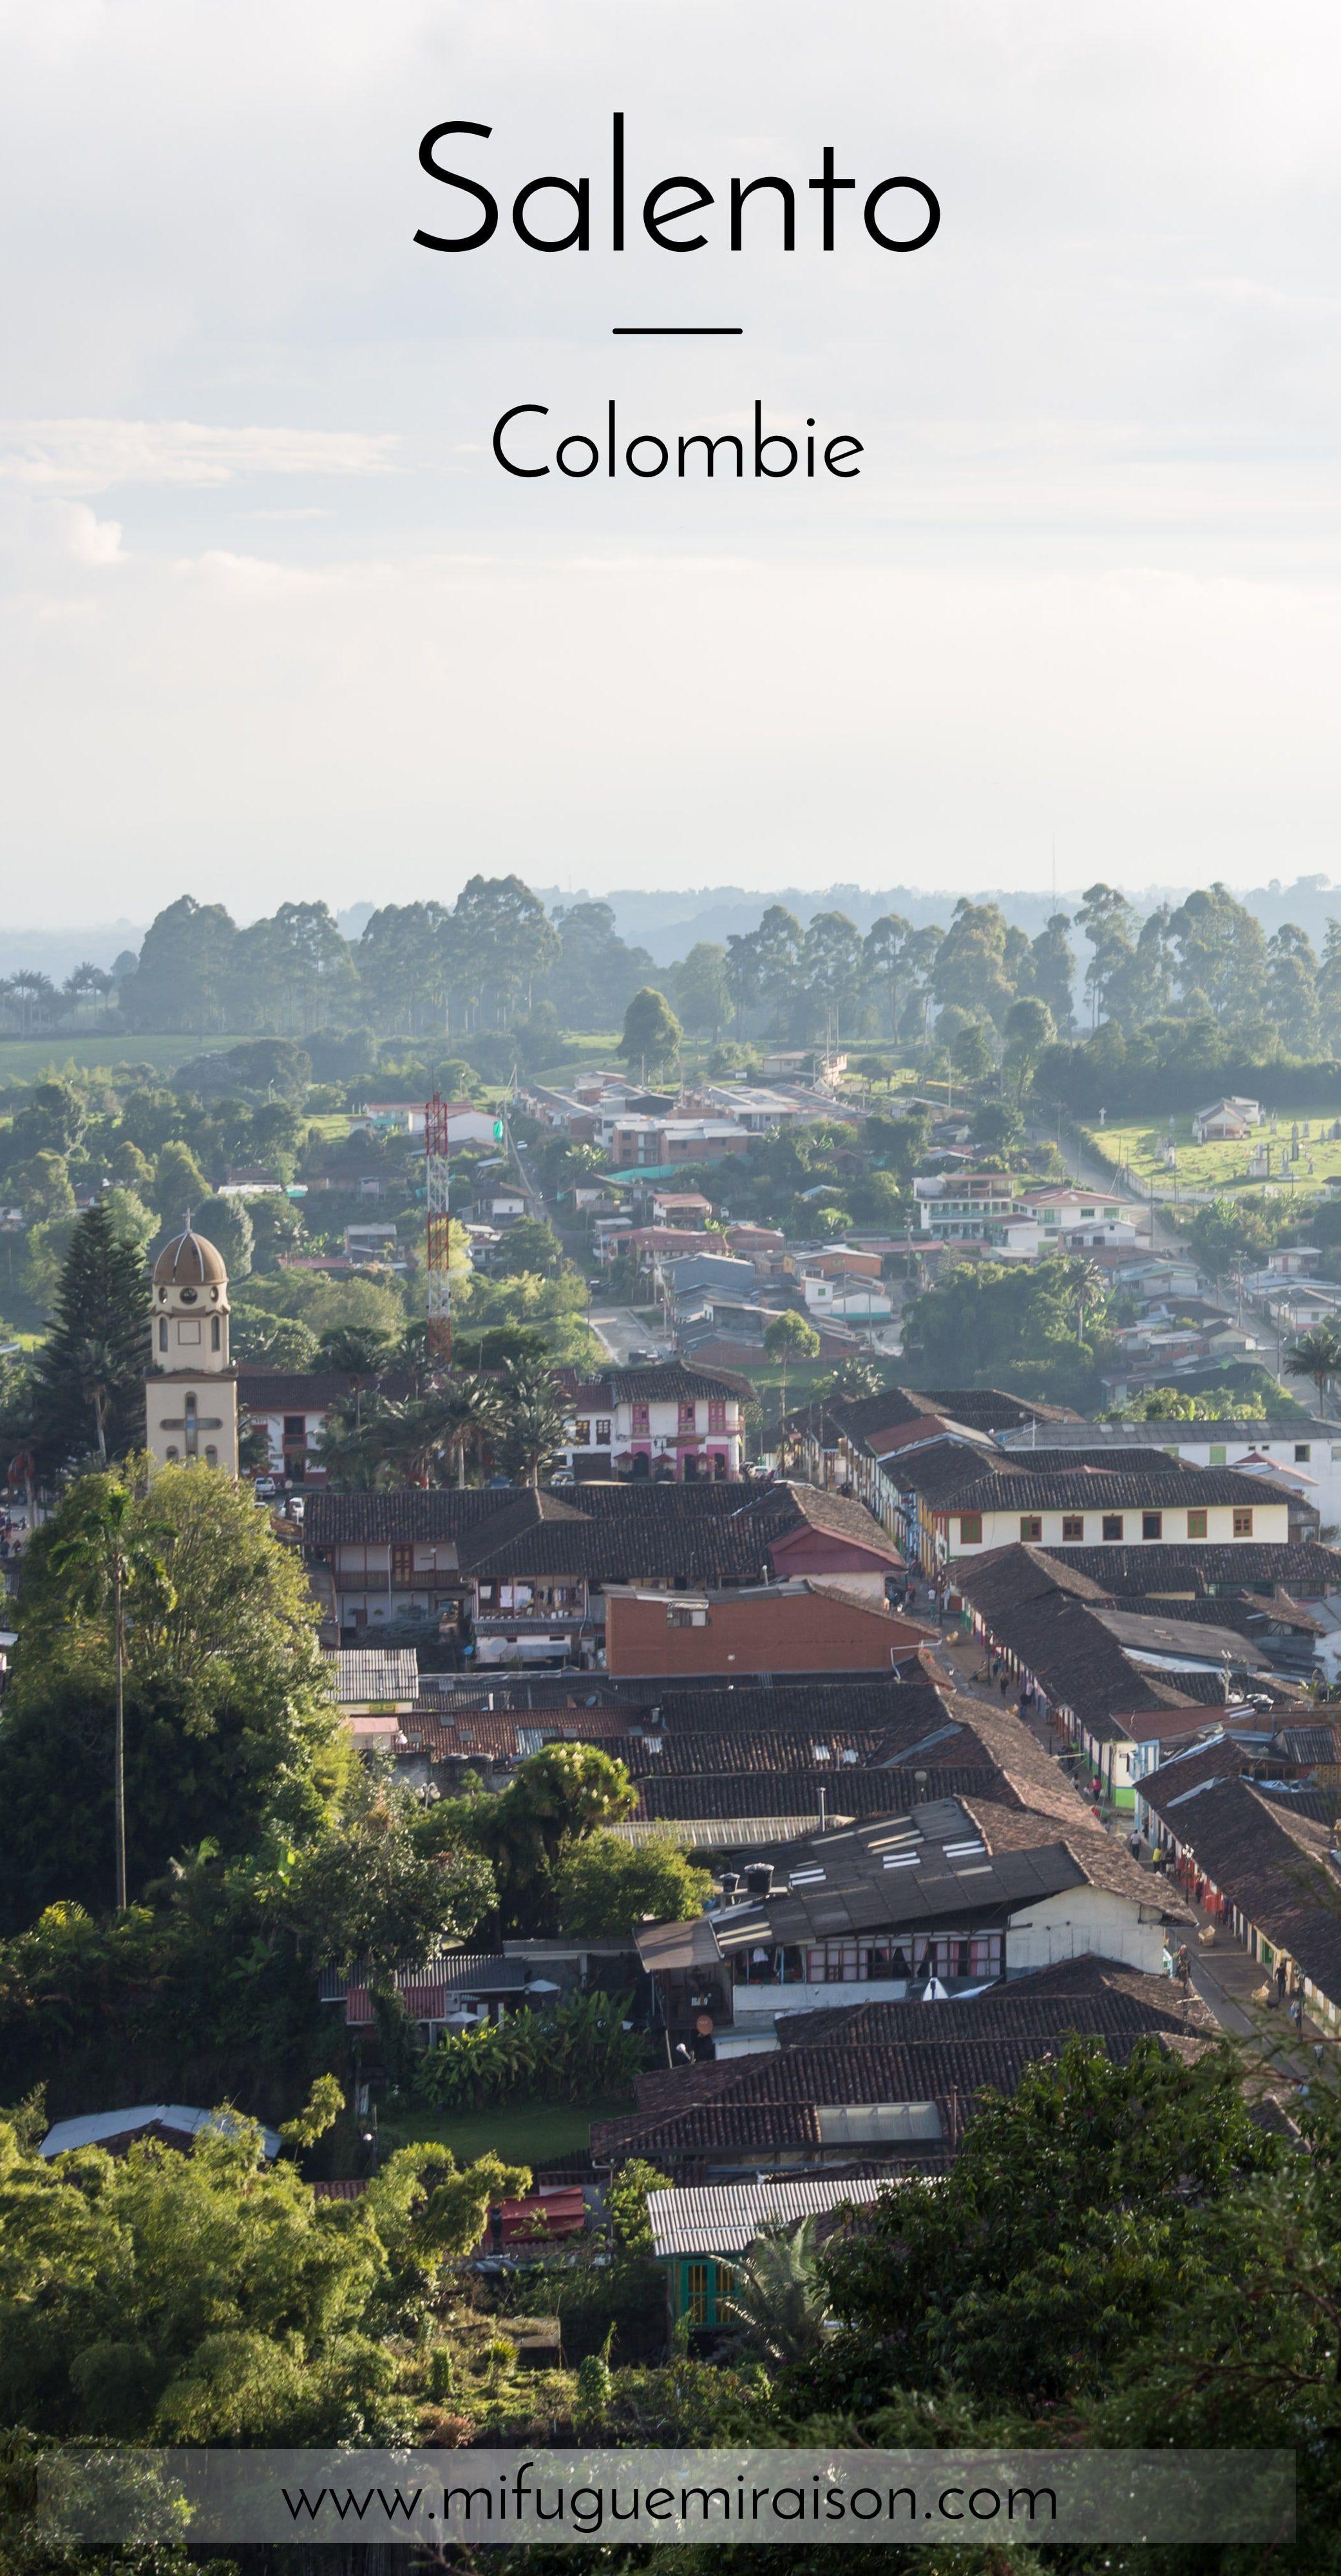 Salento Et La Spectaculaire Vallee De Cocora Colombie Paysage Voyage Colombie Voyage Amerique